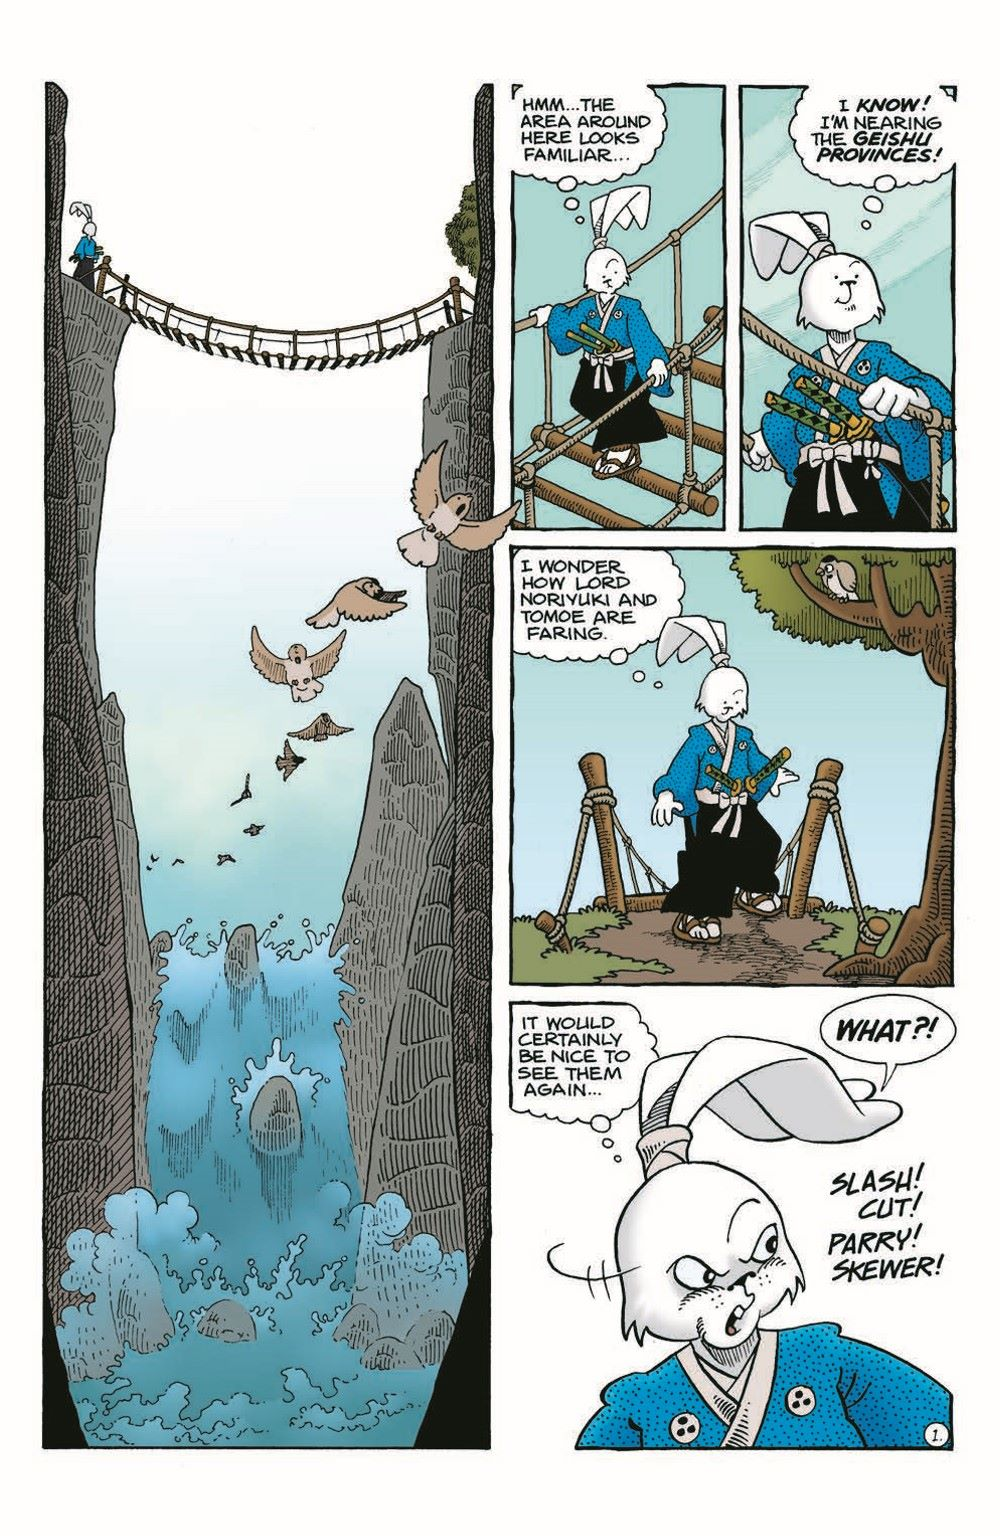 Usagi-WR05_pr-3 ComicList Previews: USAGI YOJIMBO WANDERER'S ROAD #5 (OF 6)